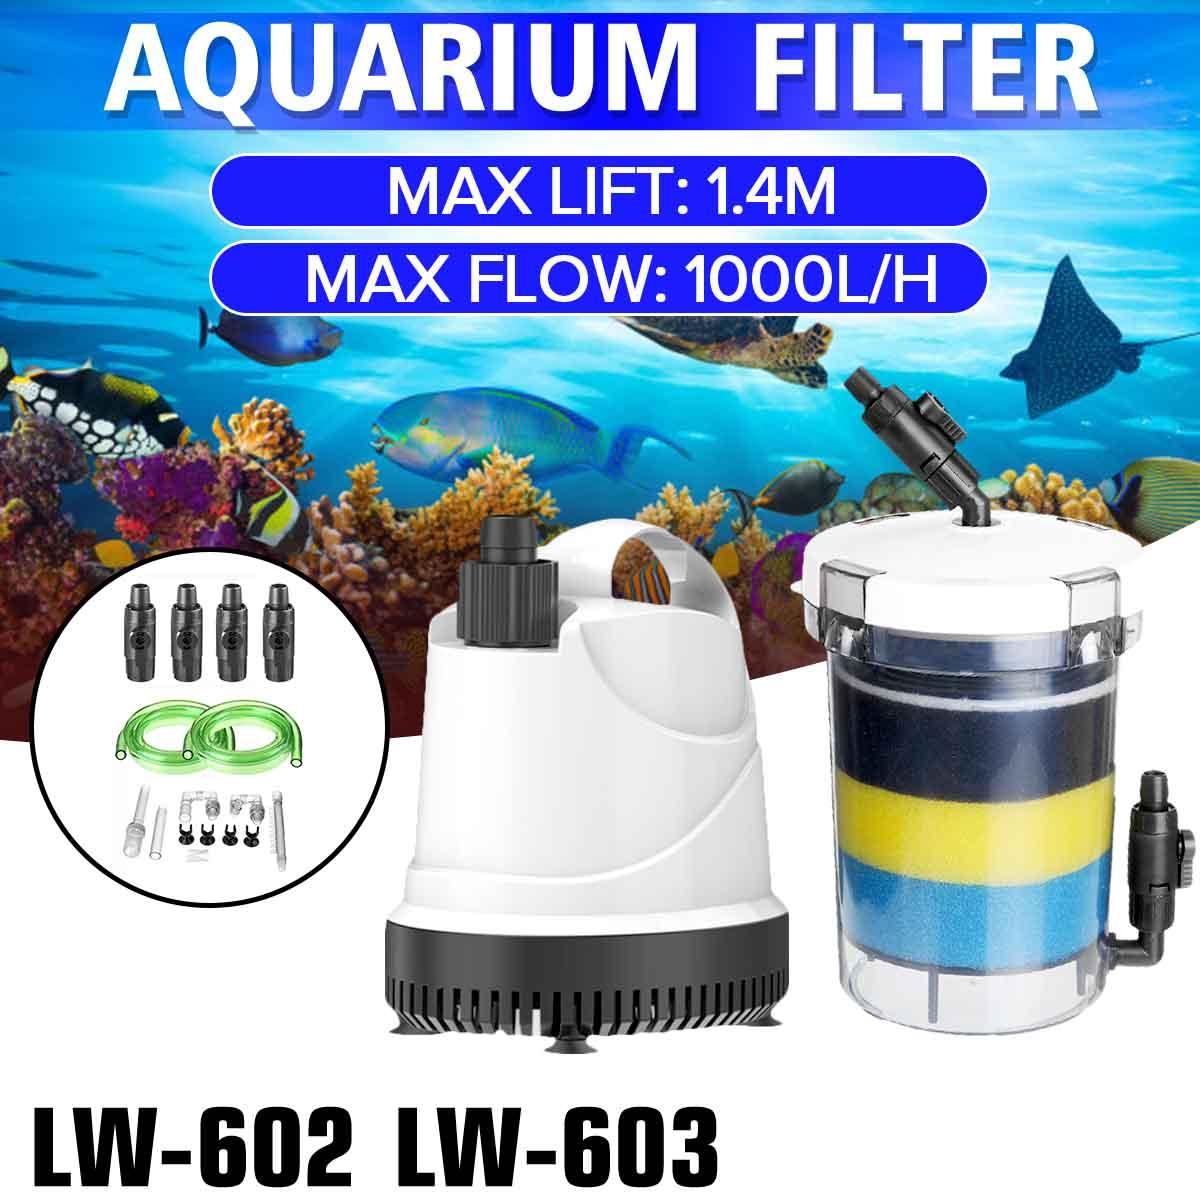 Filtro de pecera 220 V-240 V Filtro de acuario externo Ultra silencioso cubo Filtro de acuario bomba LW602 LW603 EW-604 B 1000L/h